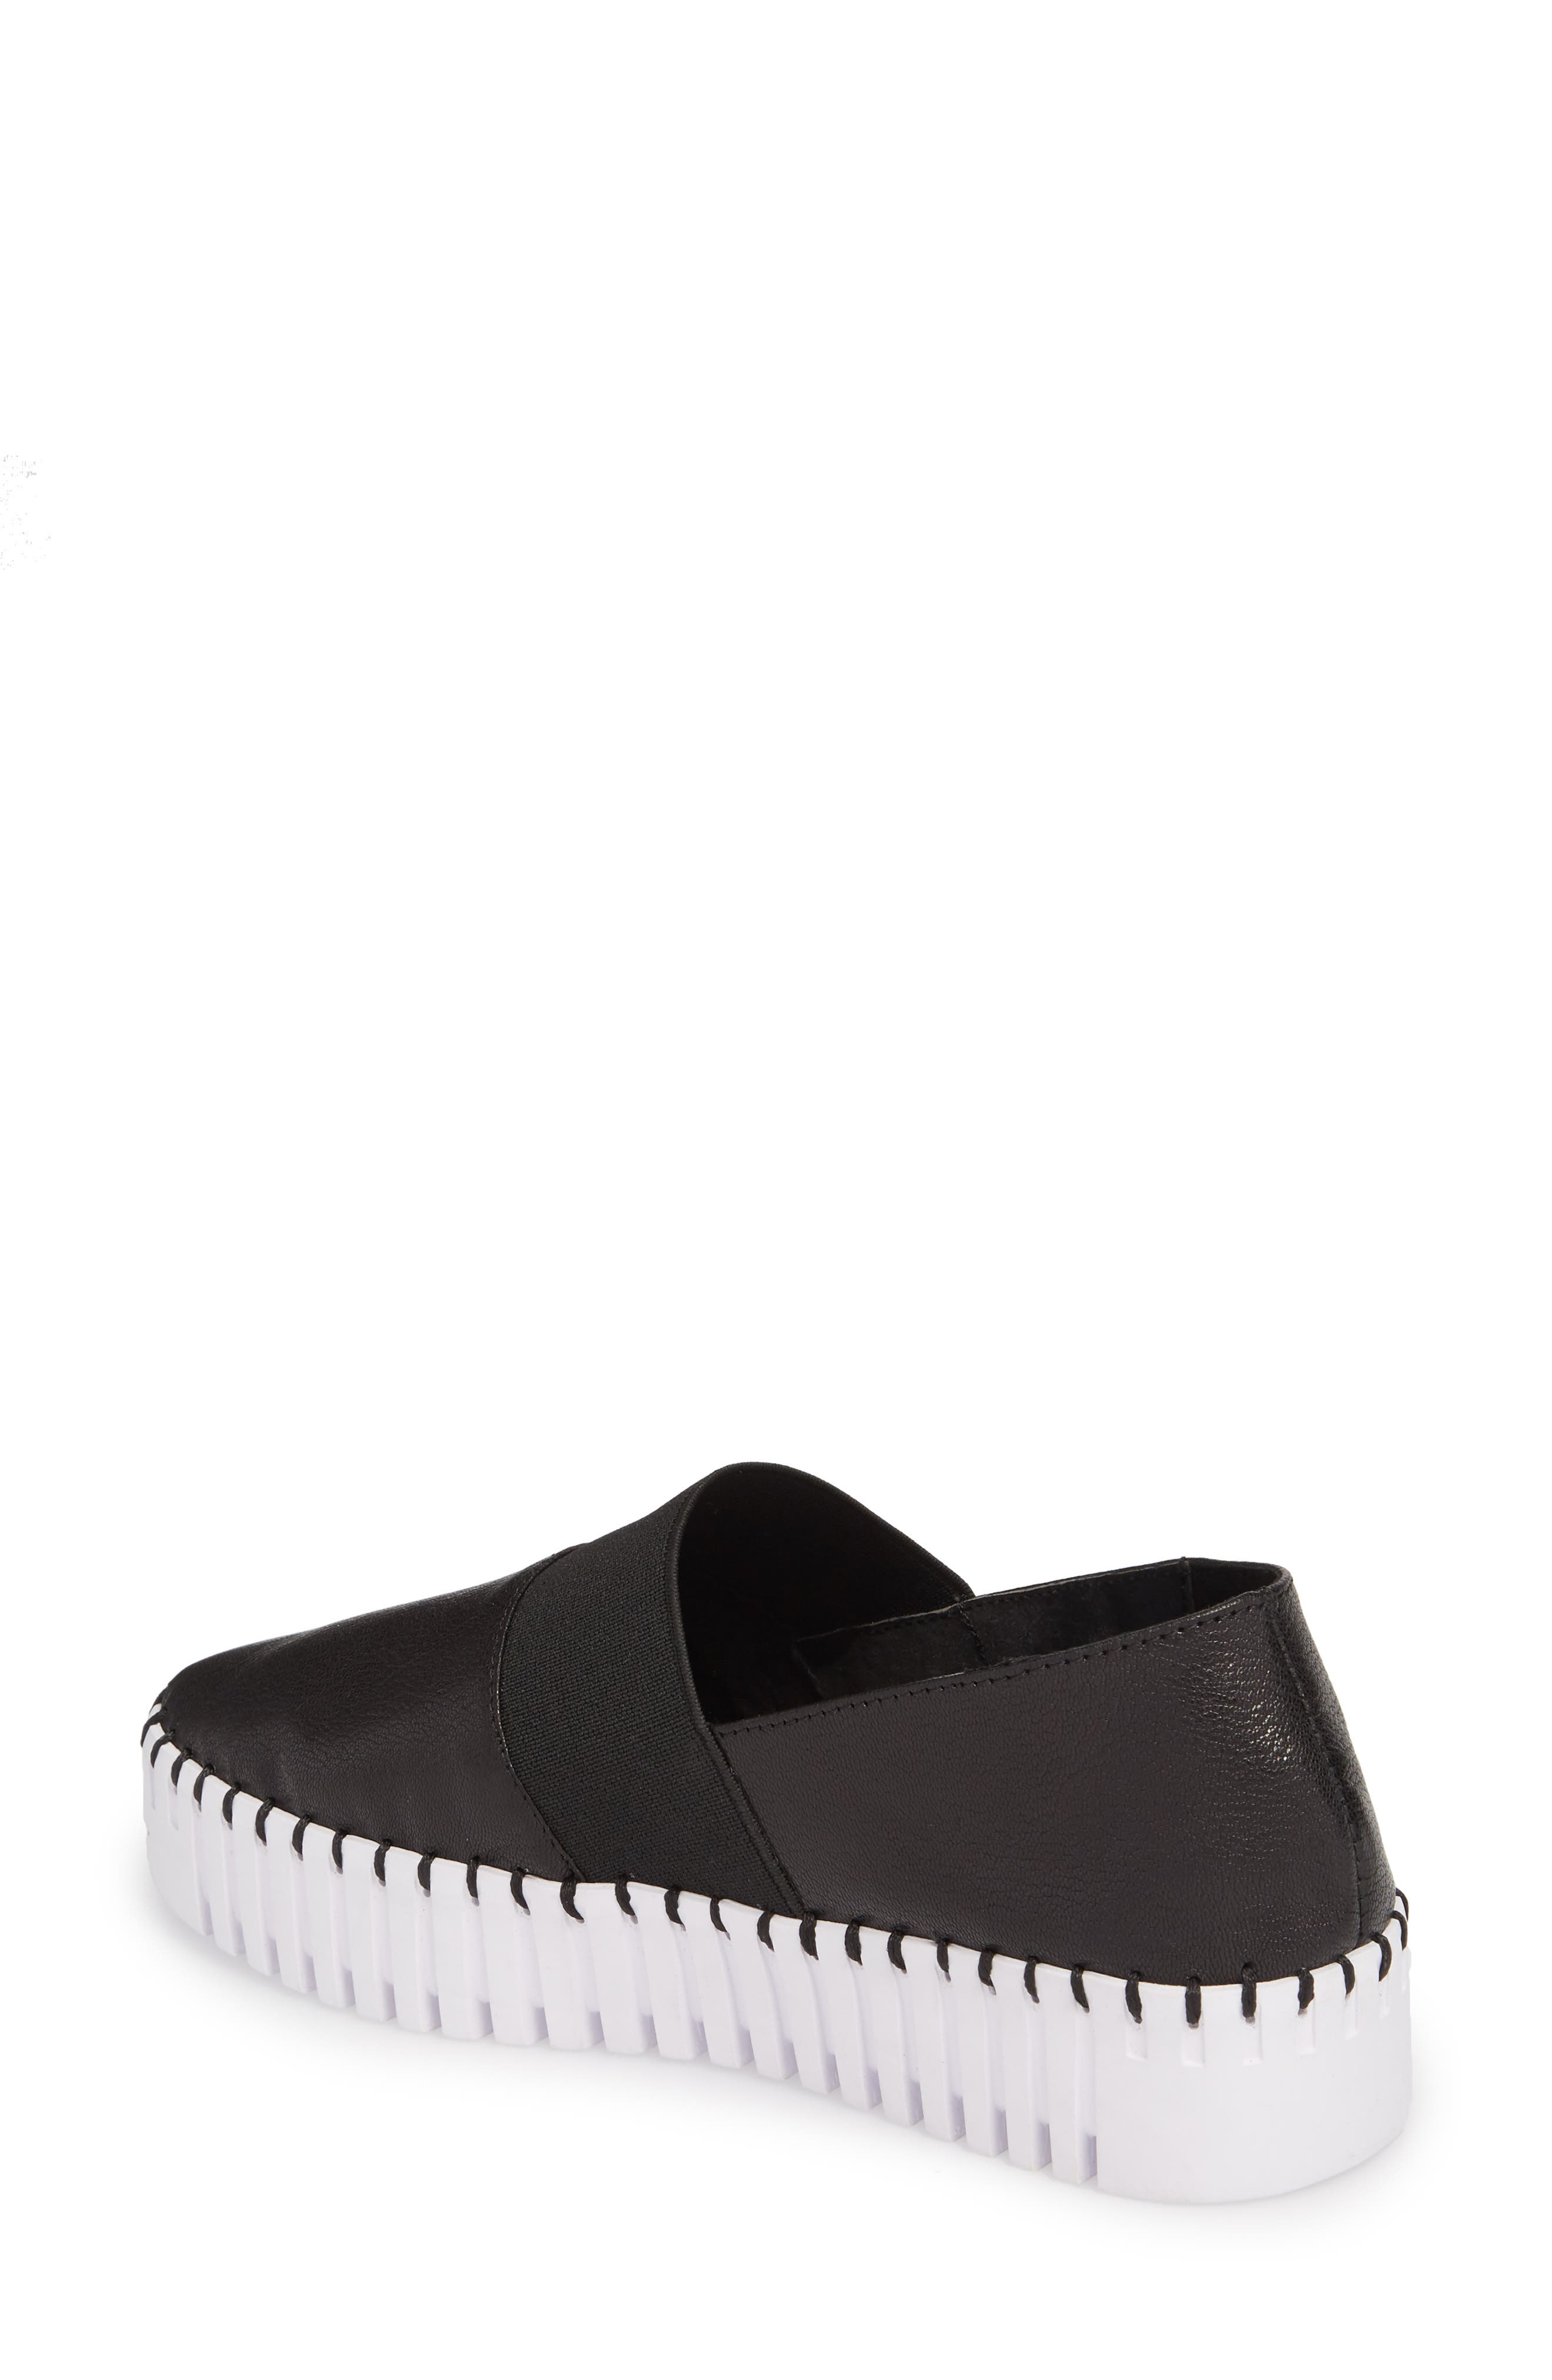 Cube Slip-On Platform Sneaker,                             Alternate thumbnail 2, color,                             Black Leather